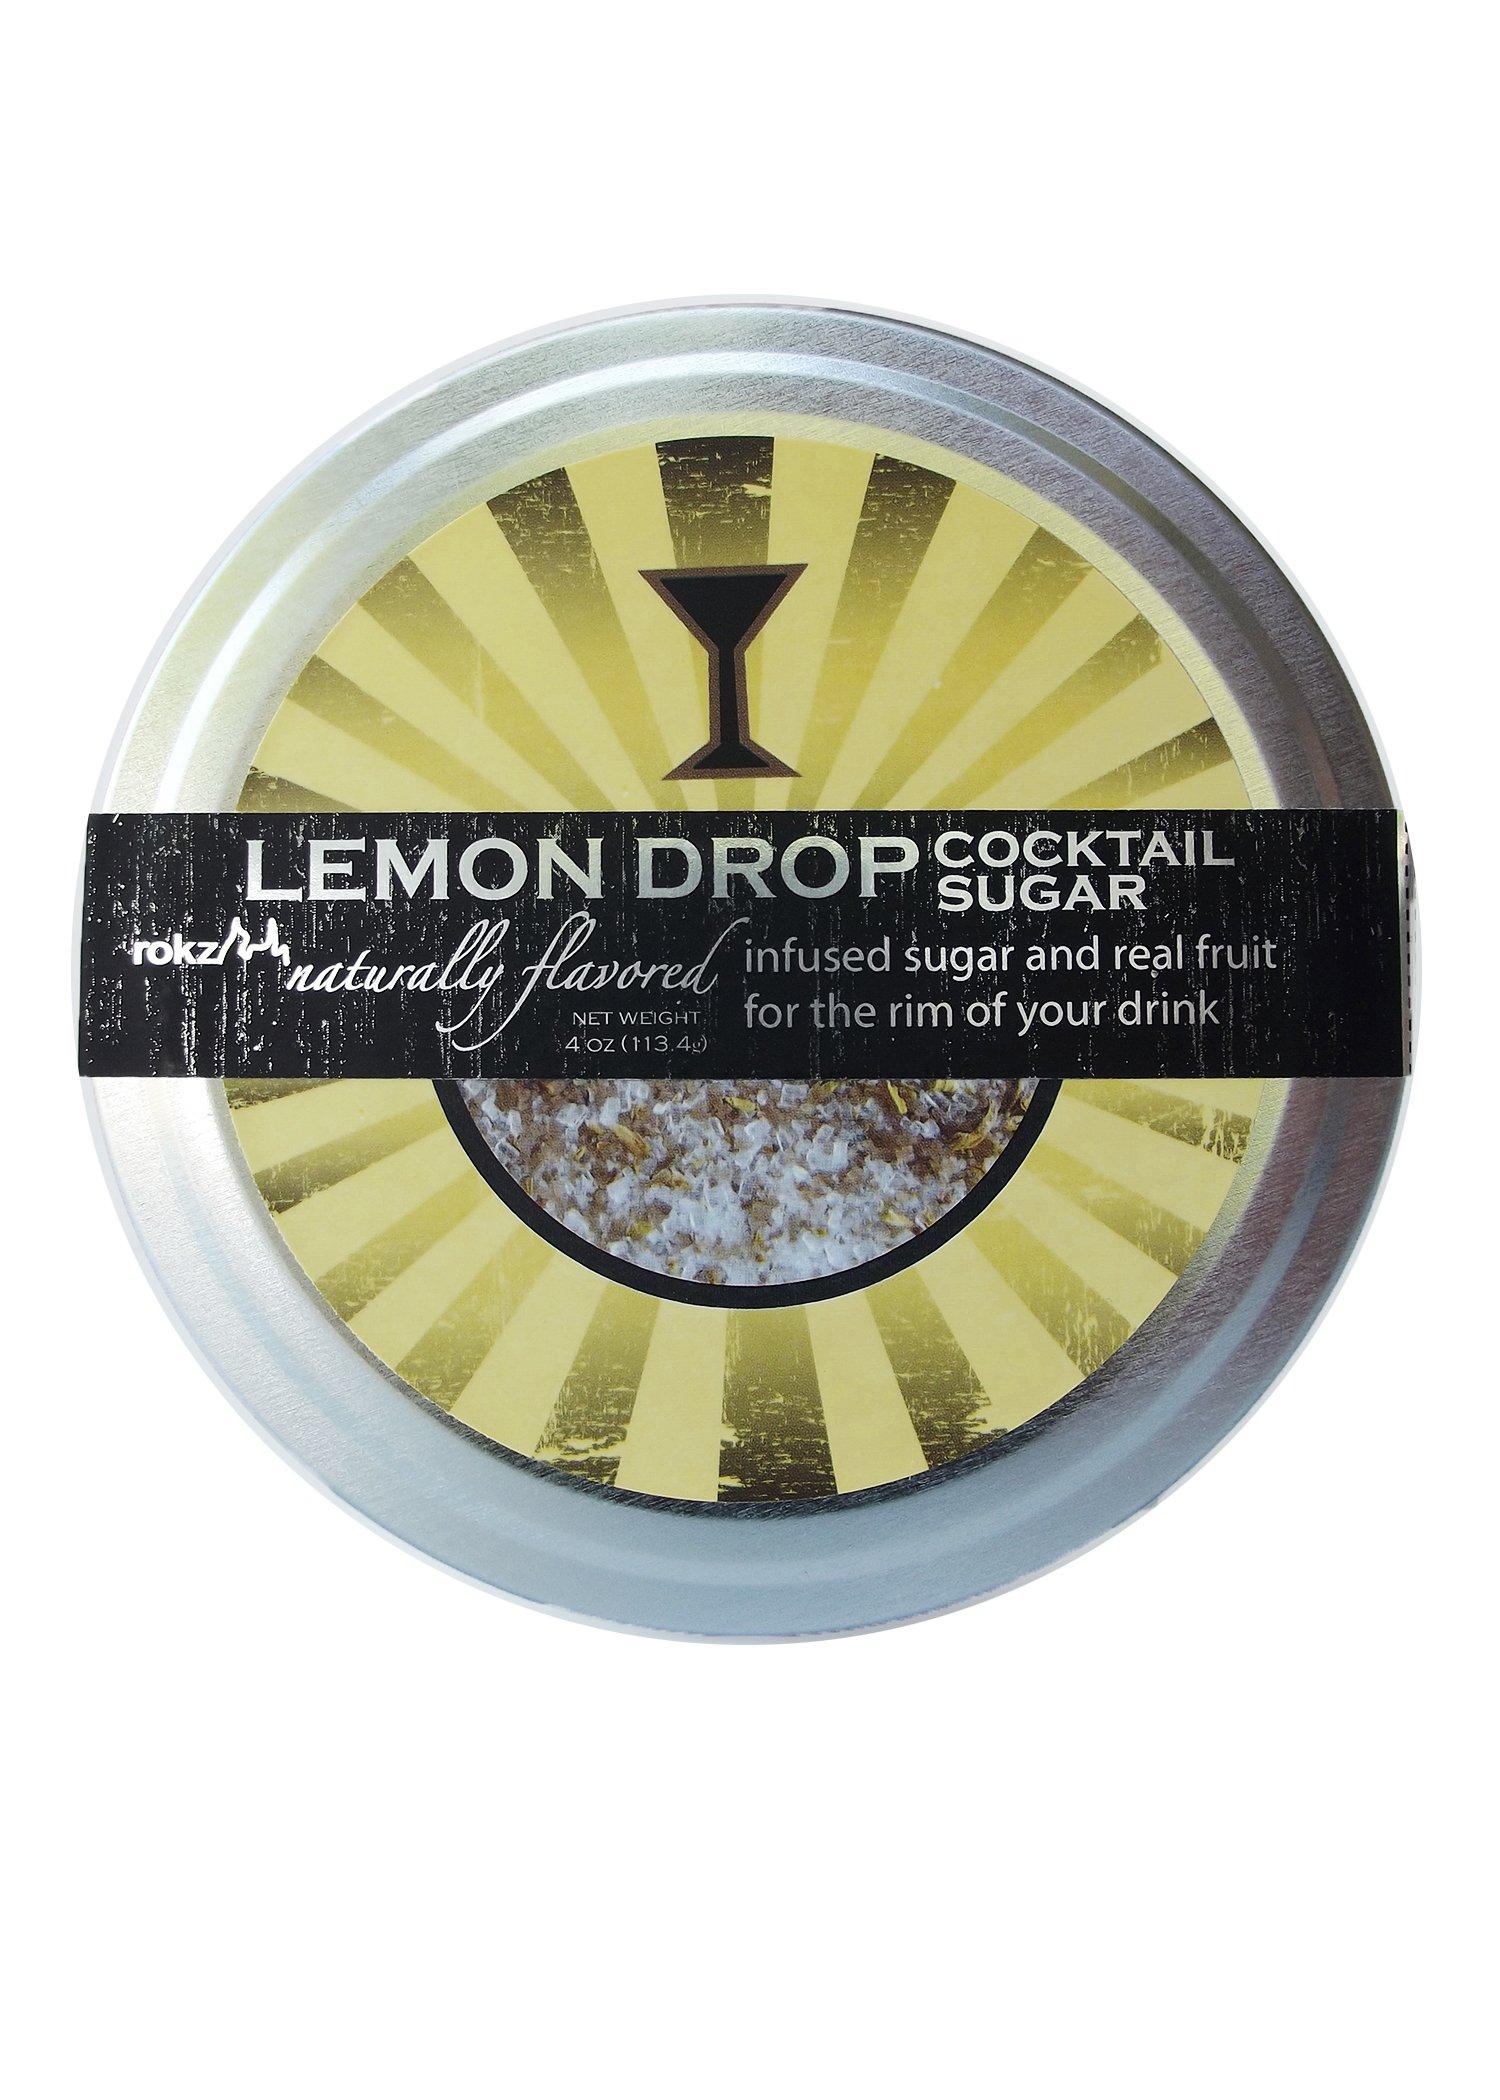 Rokz Design Group Infused Cocktail Sugar, Lemon Drop, 4 Ounce